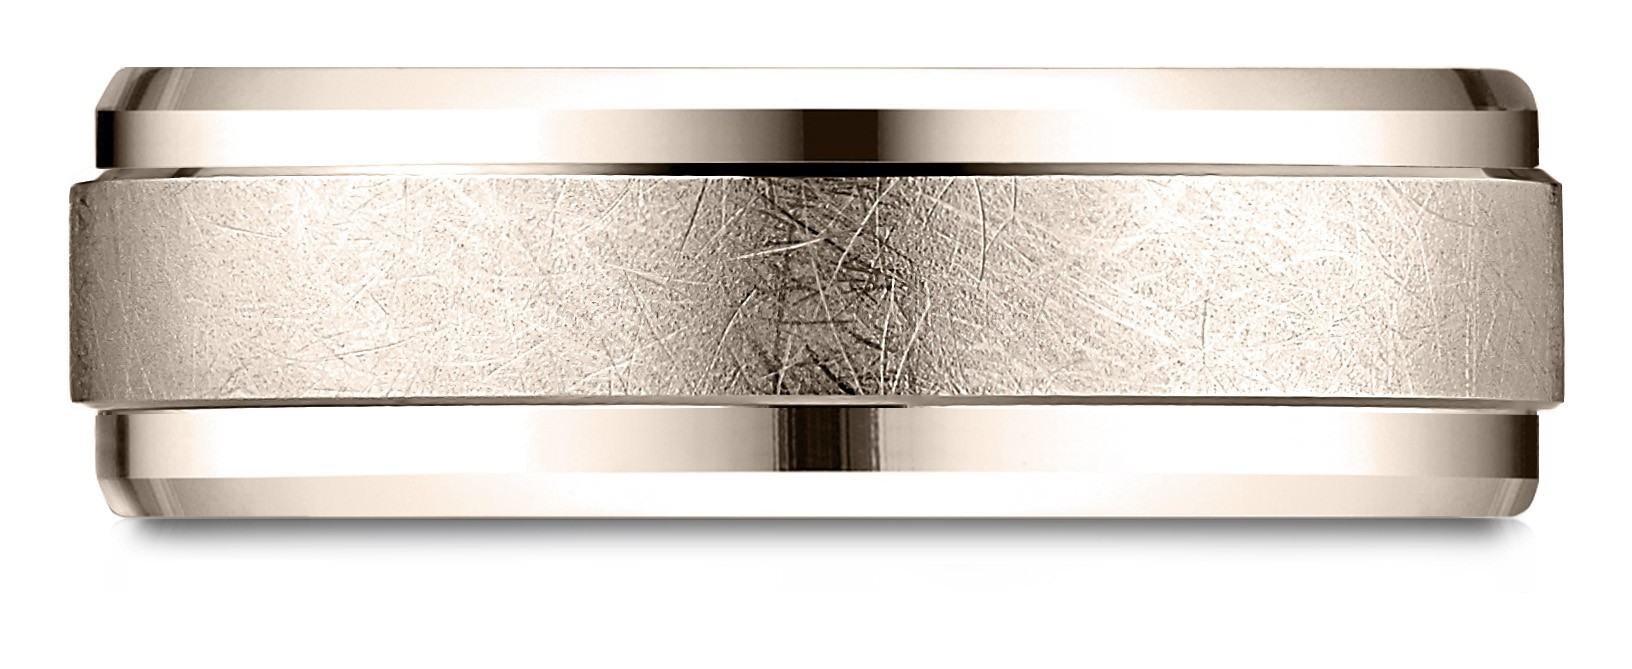 14 Karat Rose Gold 7mm Comfort-fit Drop Bevel Swirl Finish Center Design Band